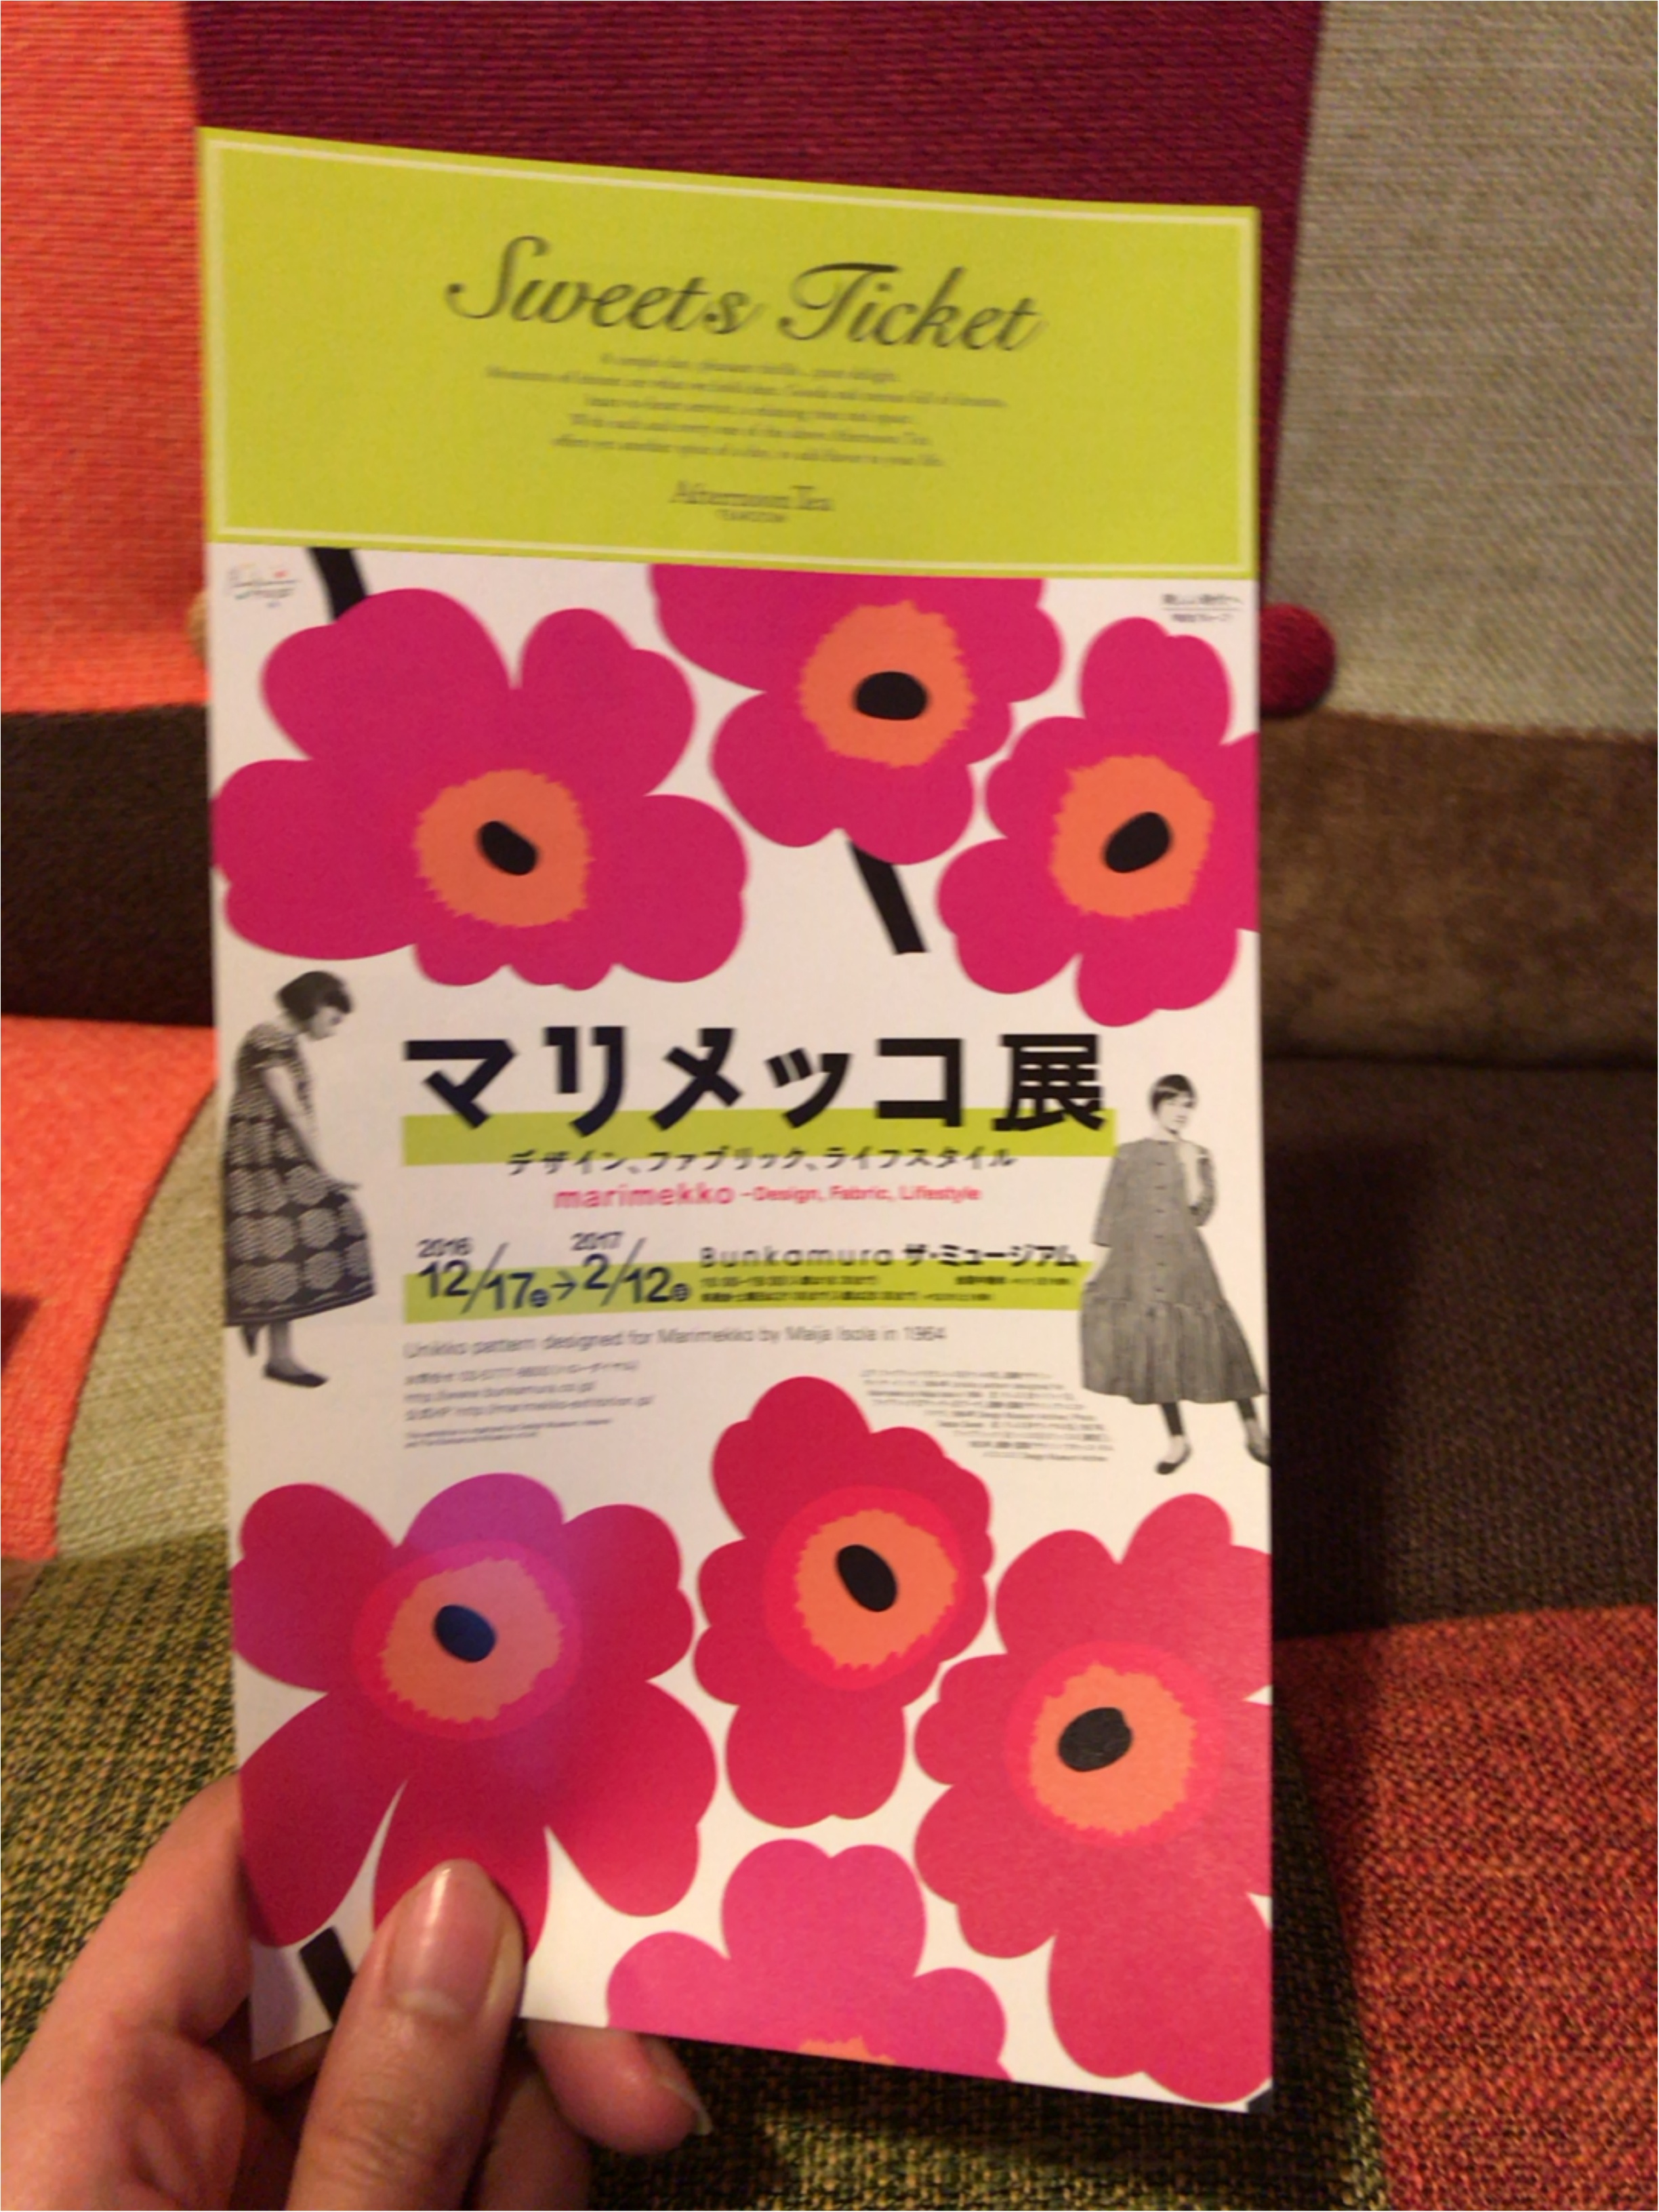 marimekko~渋谷で開催中のマリメッコ展へ行ってきました♡_3